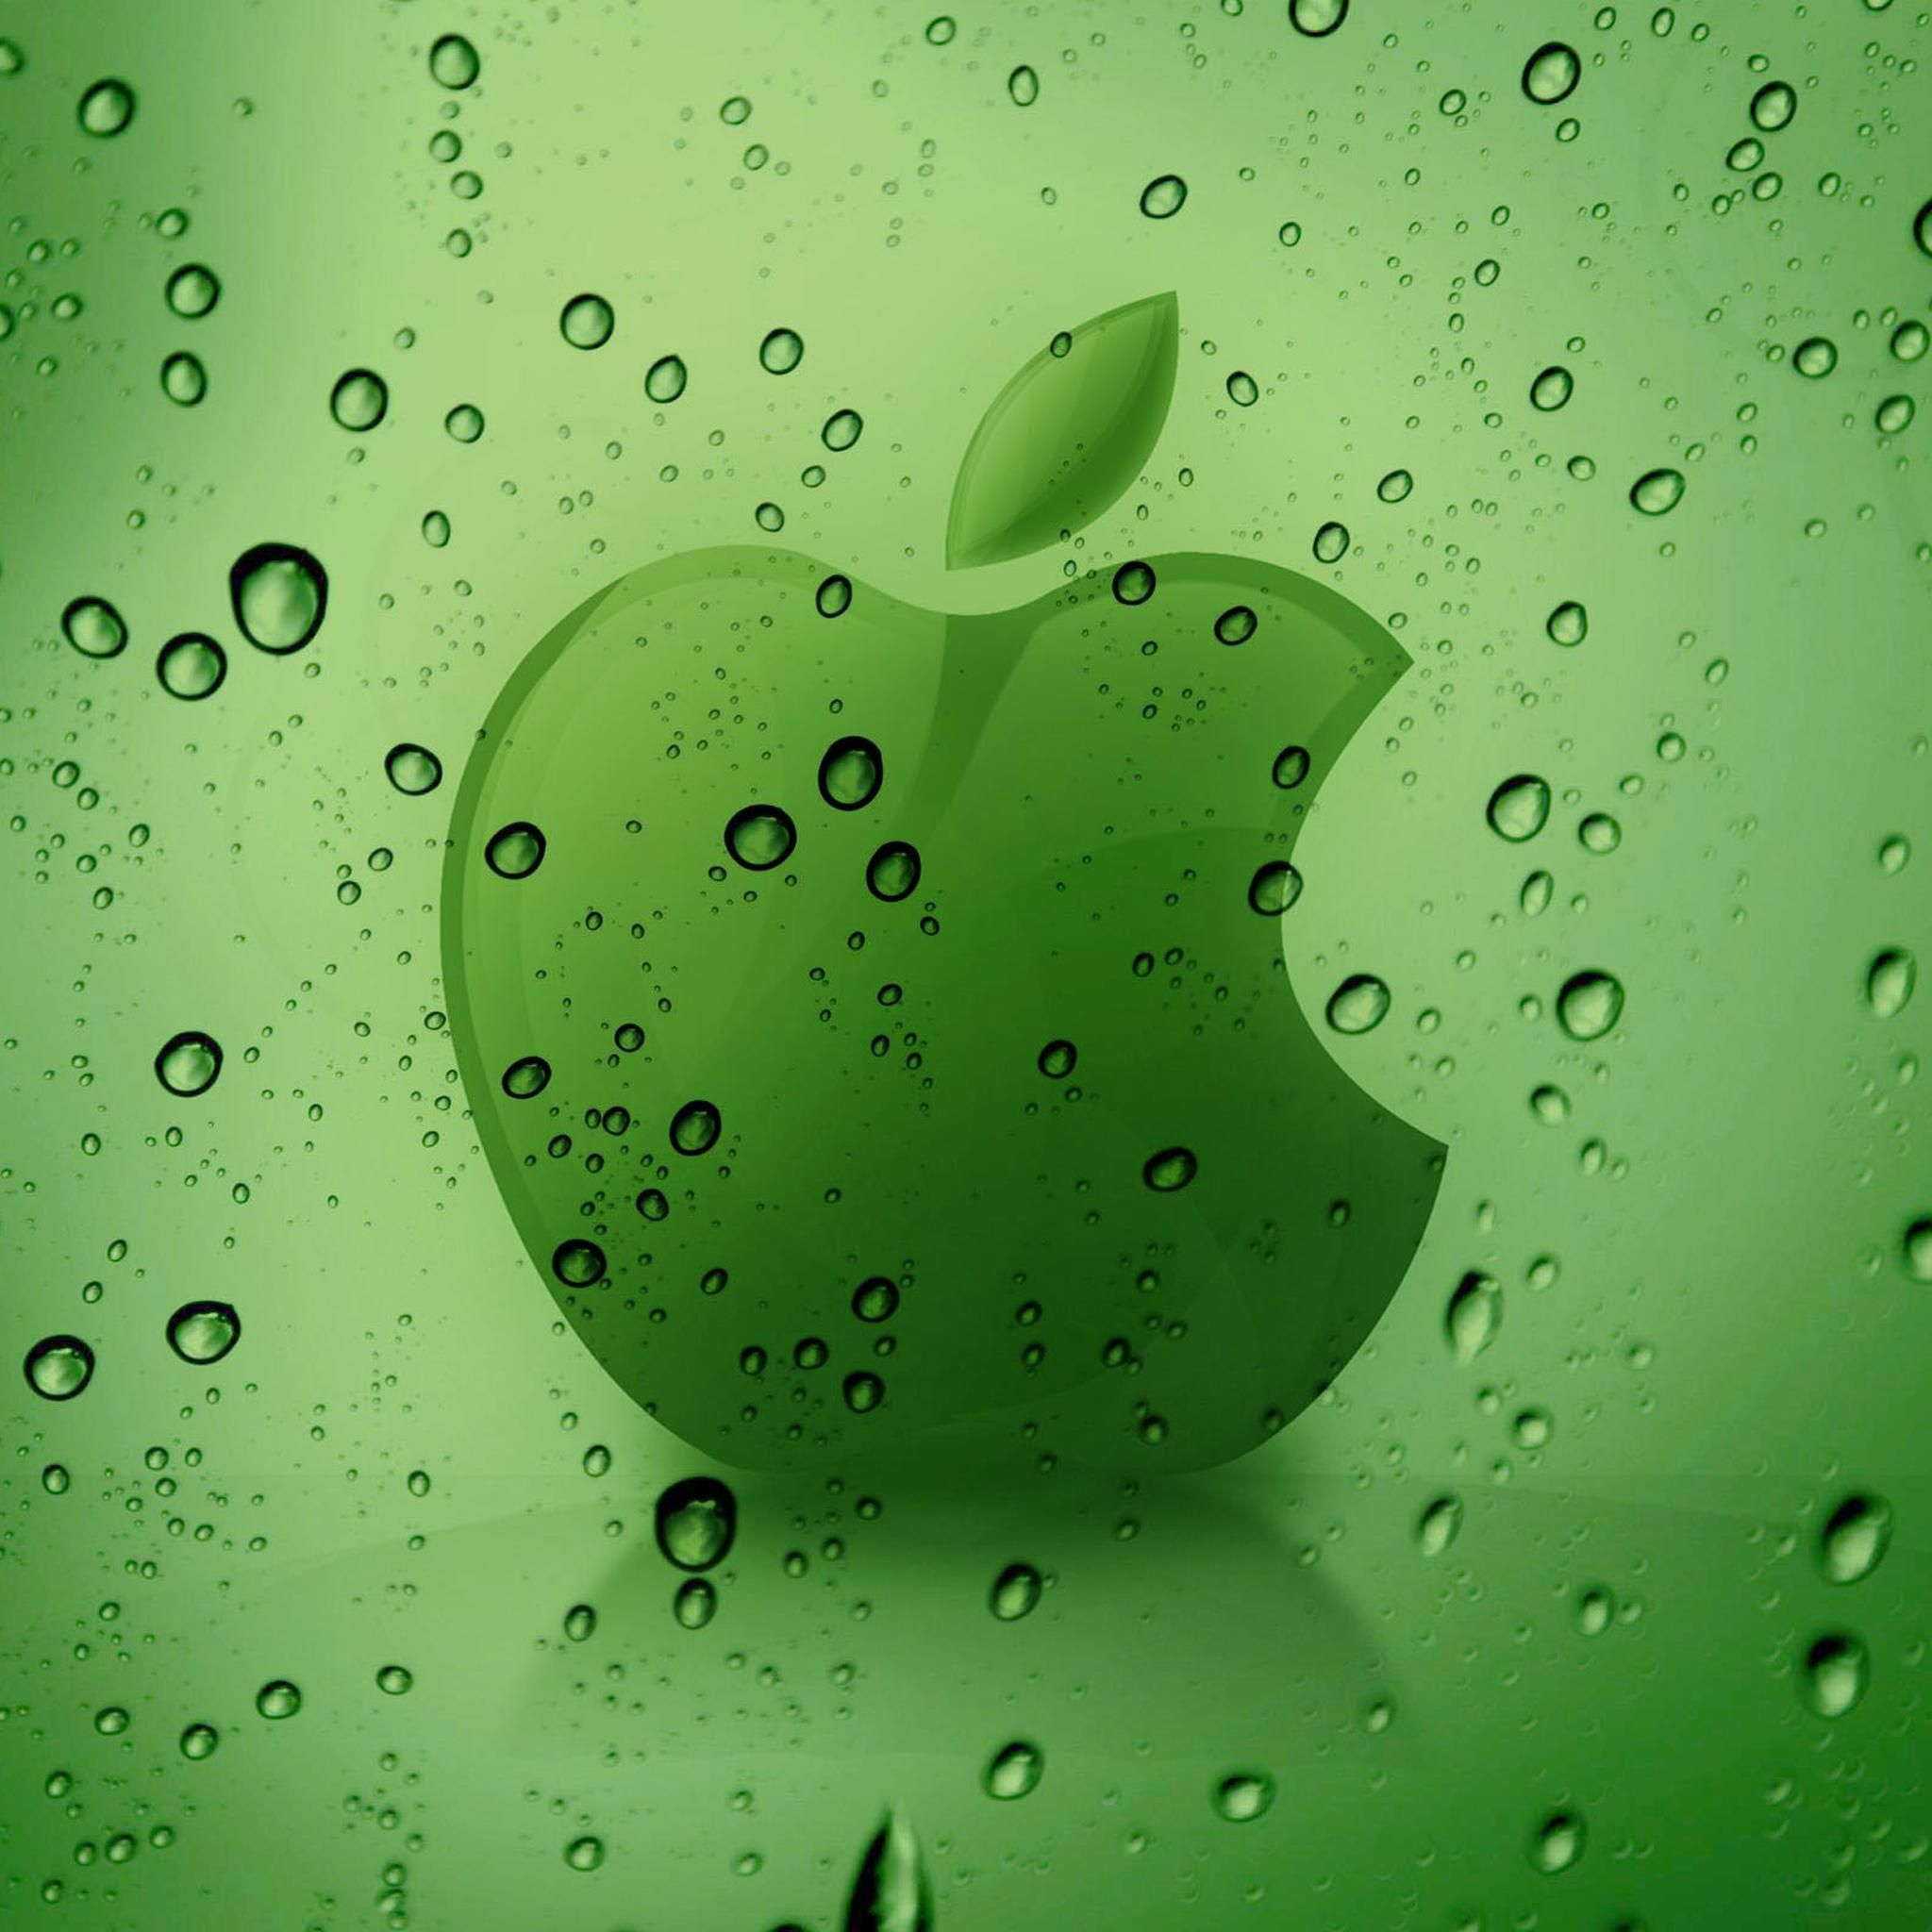 Apple Logo Behind Water Drops Retina Ipad Wallpaper Hd Ipad